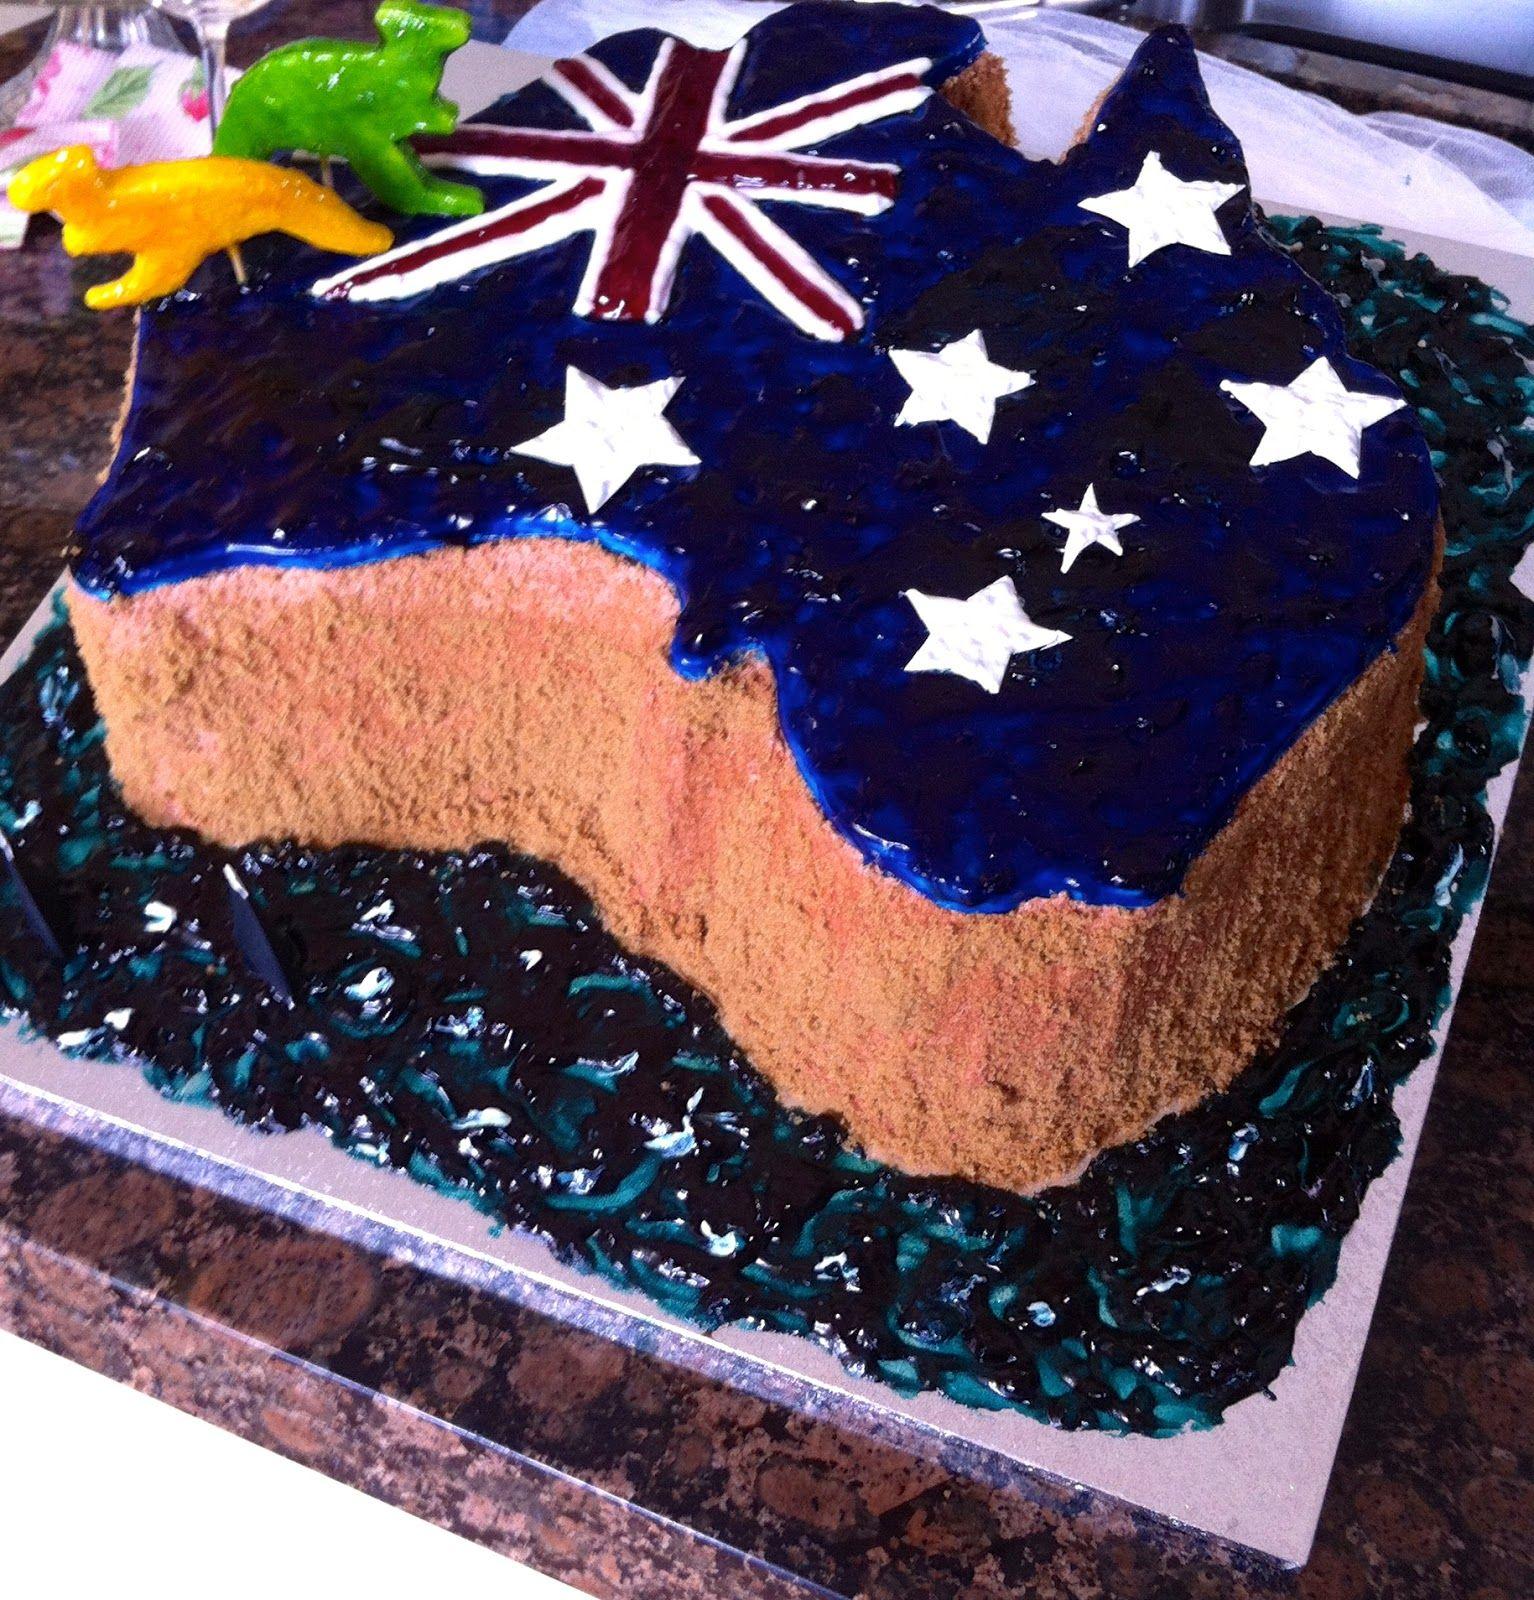 Magnolia Verandah This Cake Took The On Australia Day